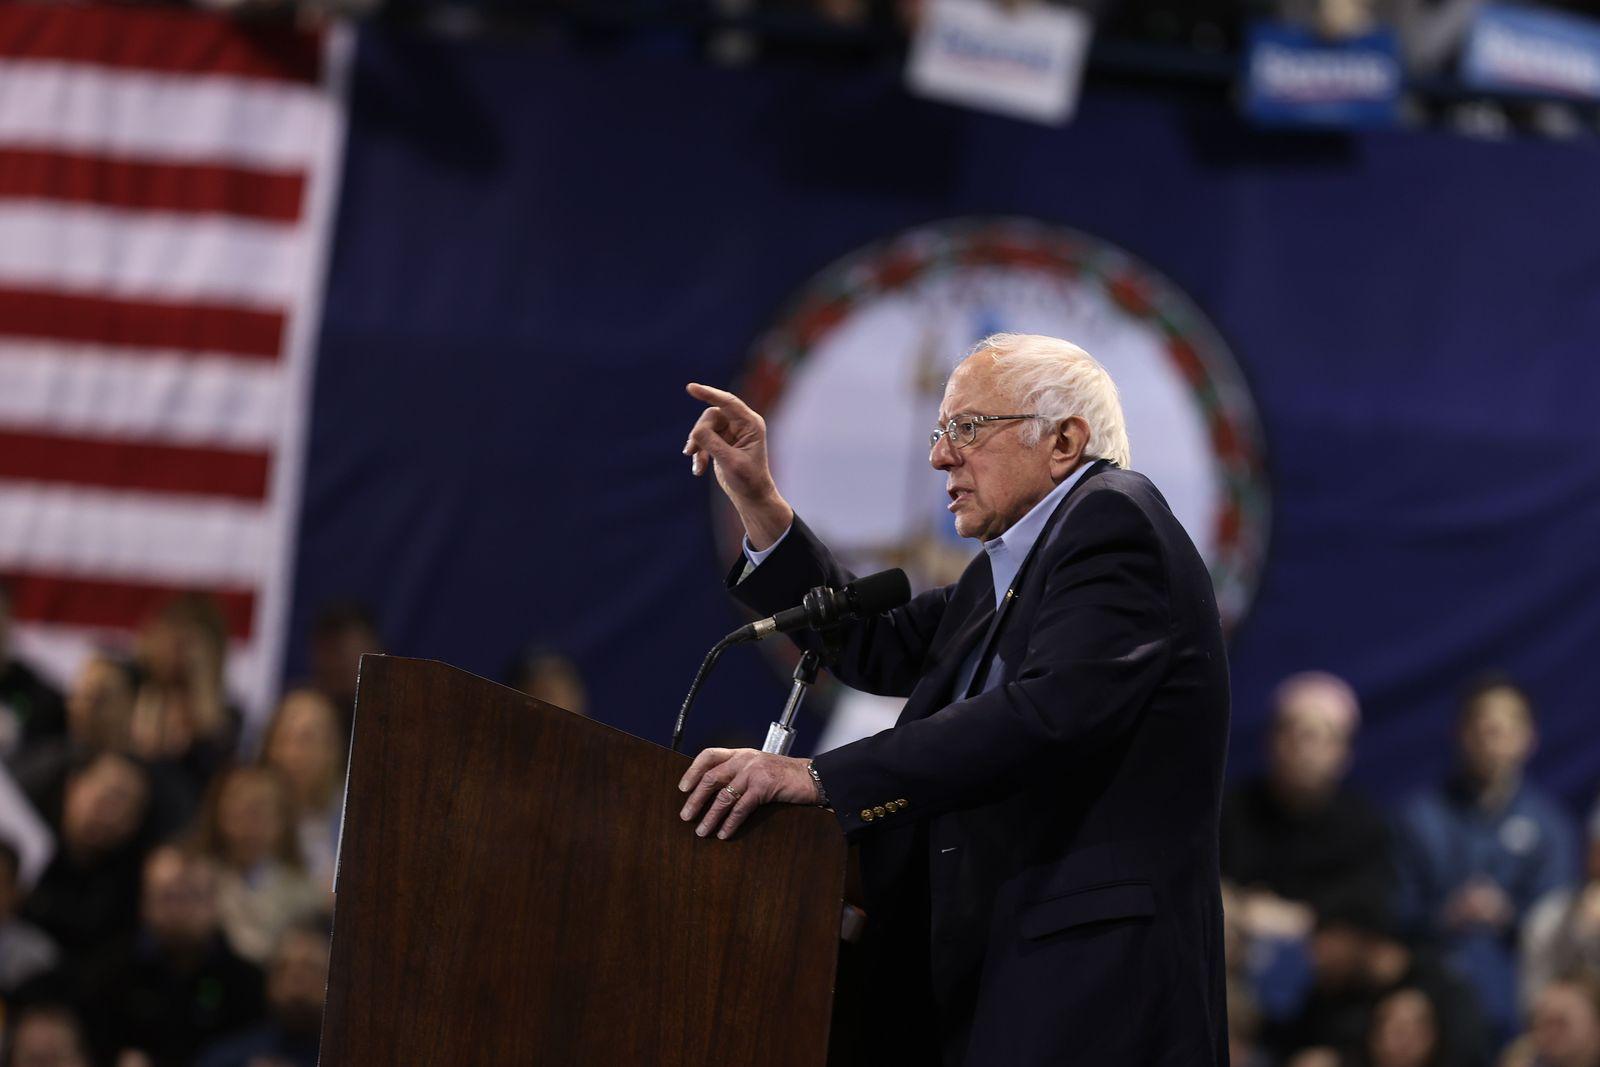 Presidential Candidate Bernie Sanders Campaigns Across U.S. Ahead Of Super Tuesday